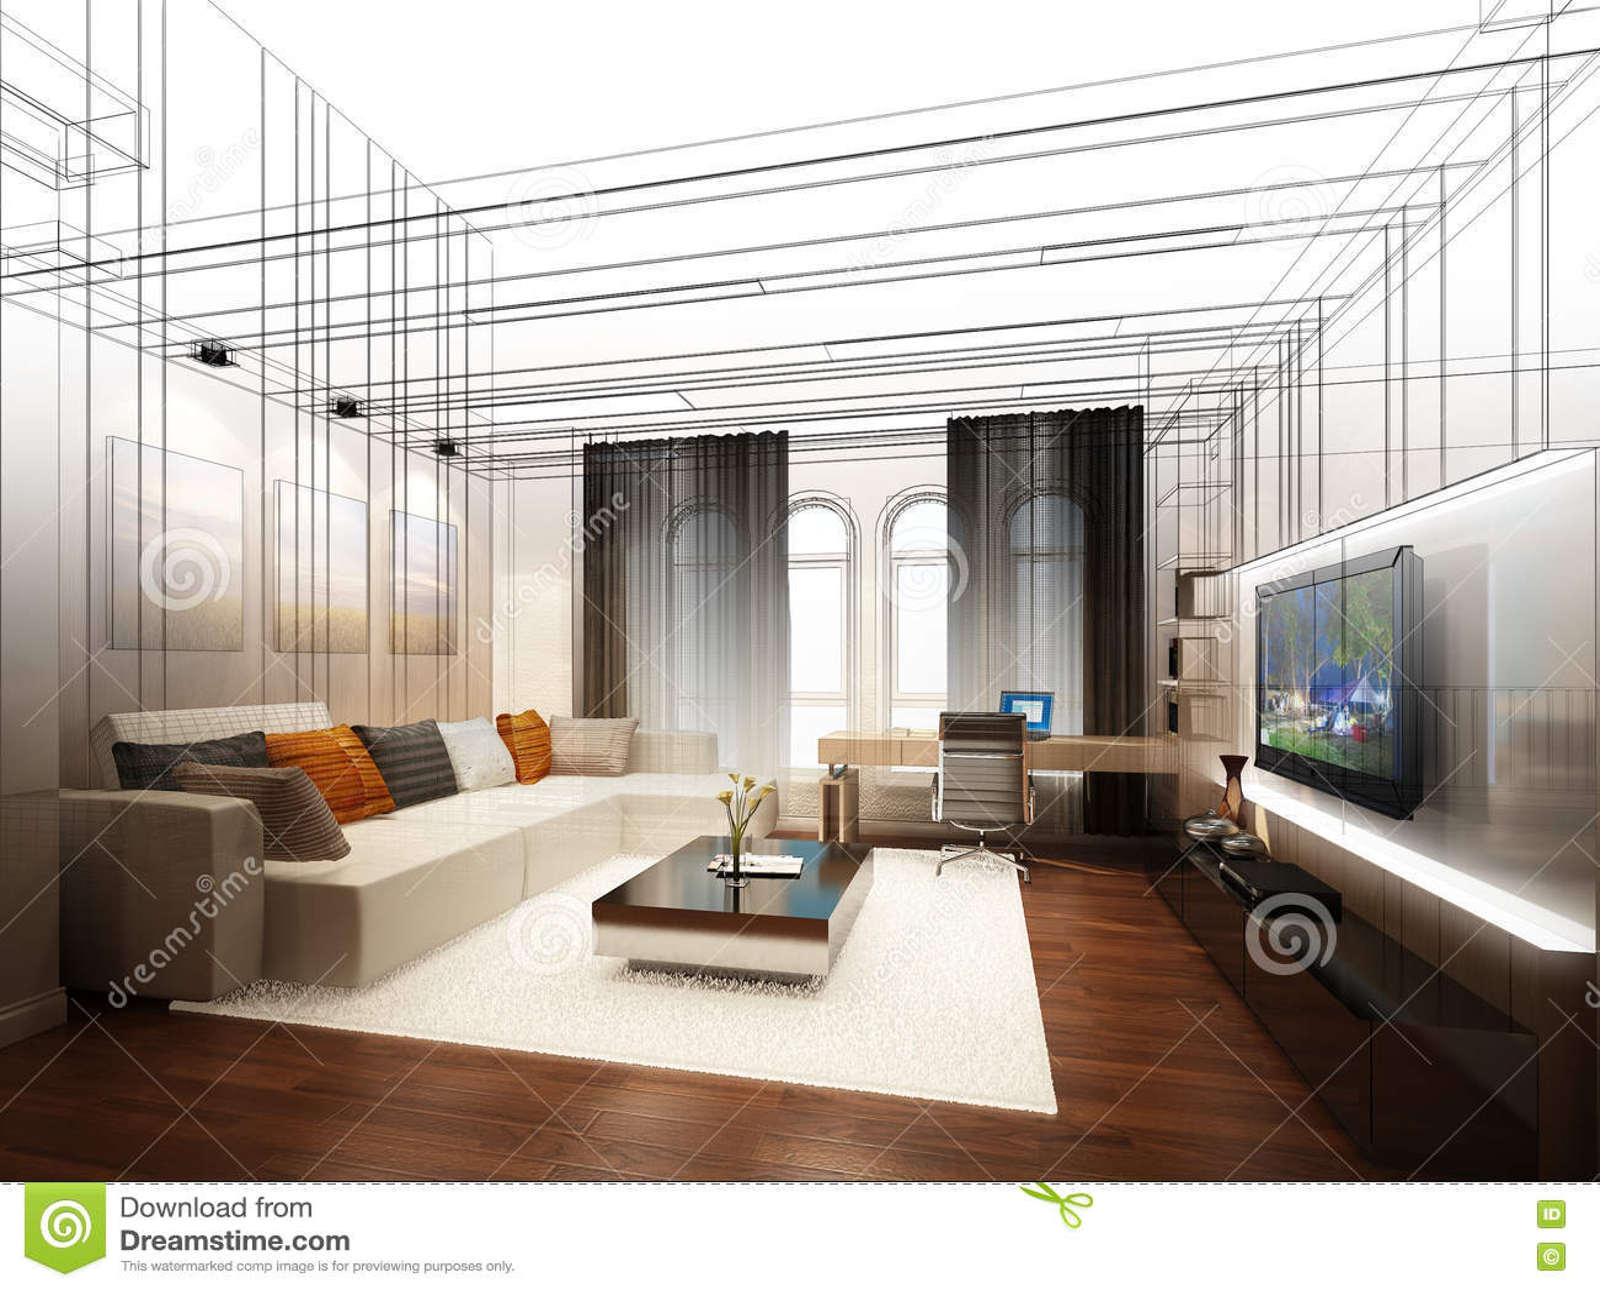 Modern Living Room Sketches modren modern living room sketches sketch of an interiorto decor